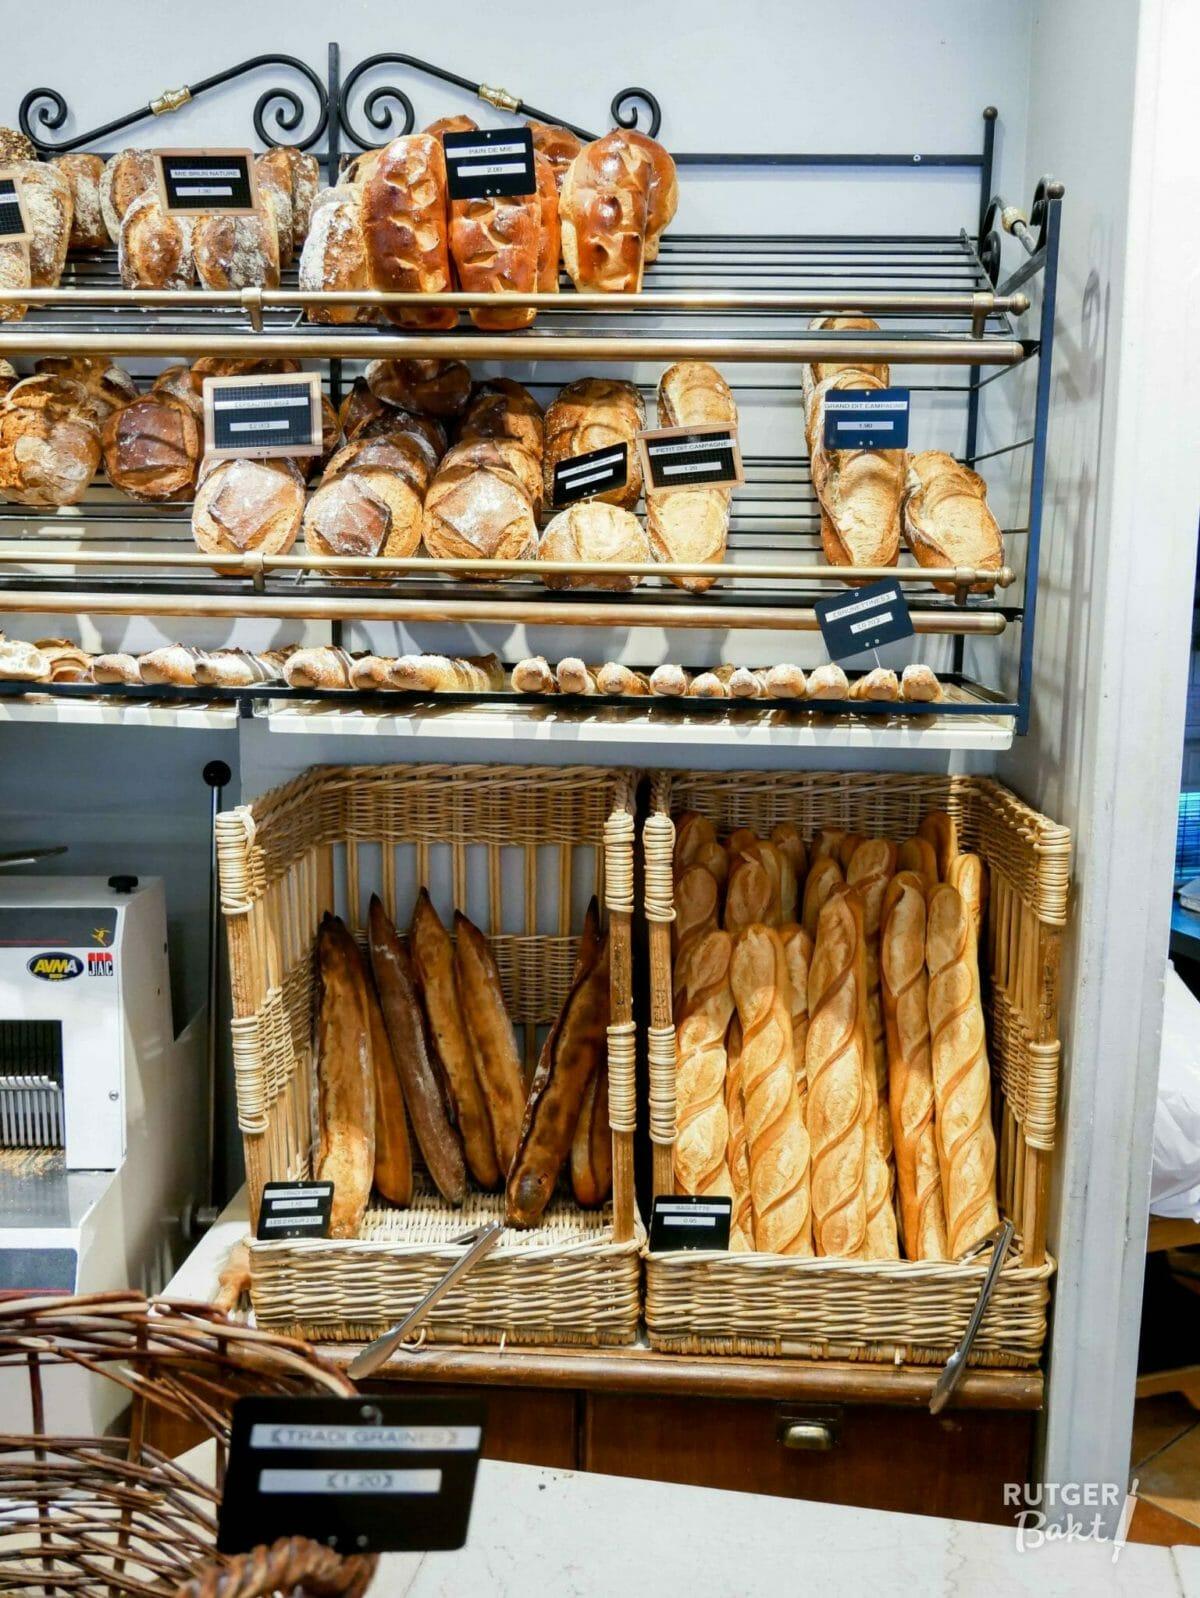 10 x brood en broodjes van de Franse Bakker